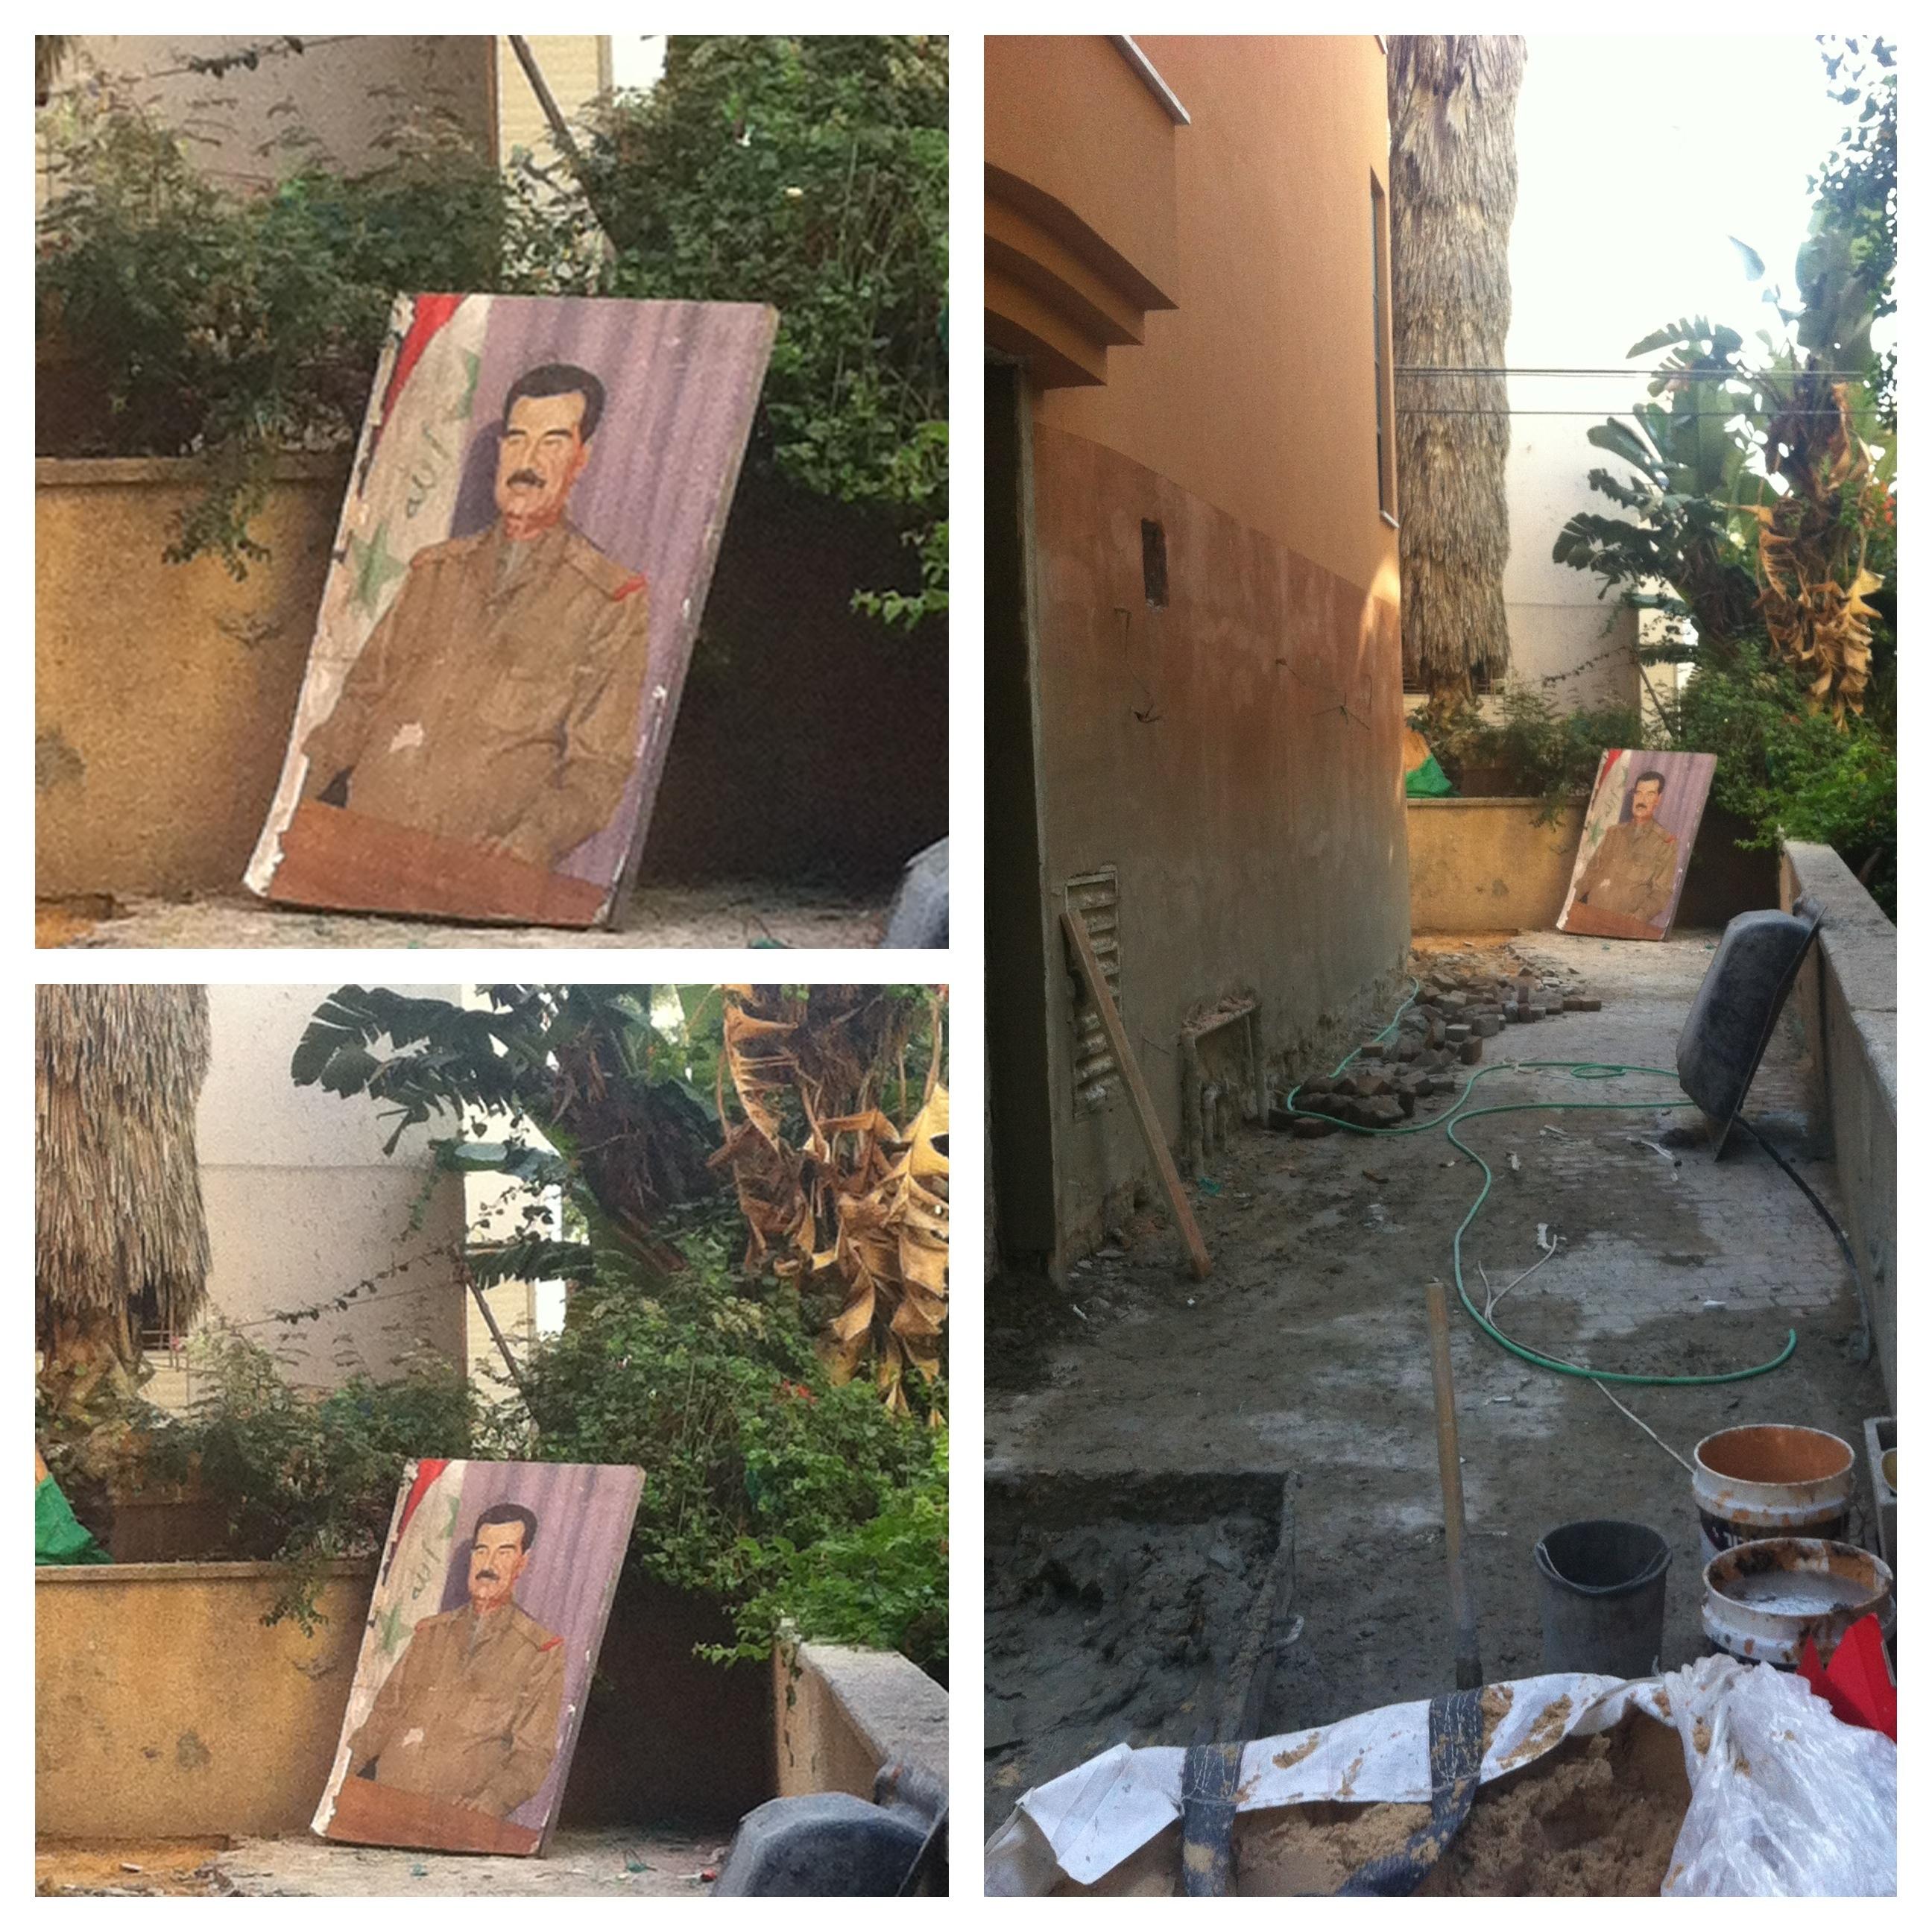 סדאם חוסיין עדיין חי